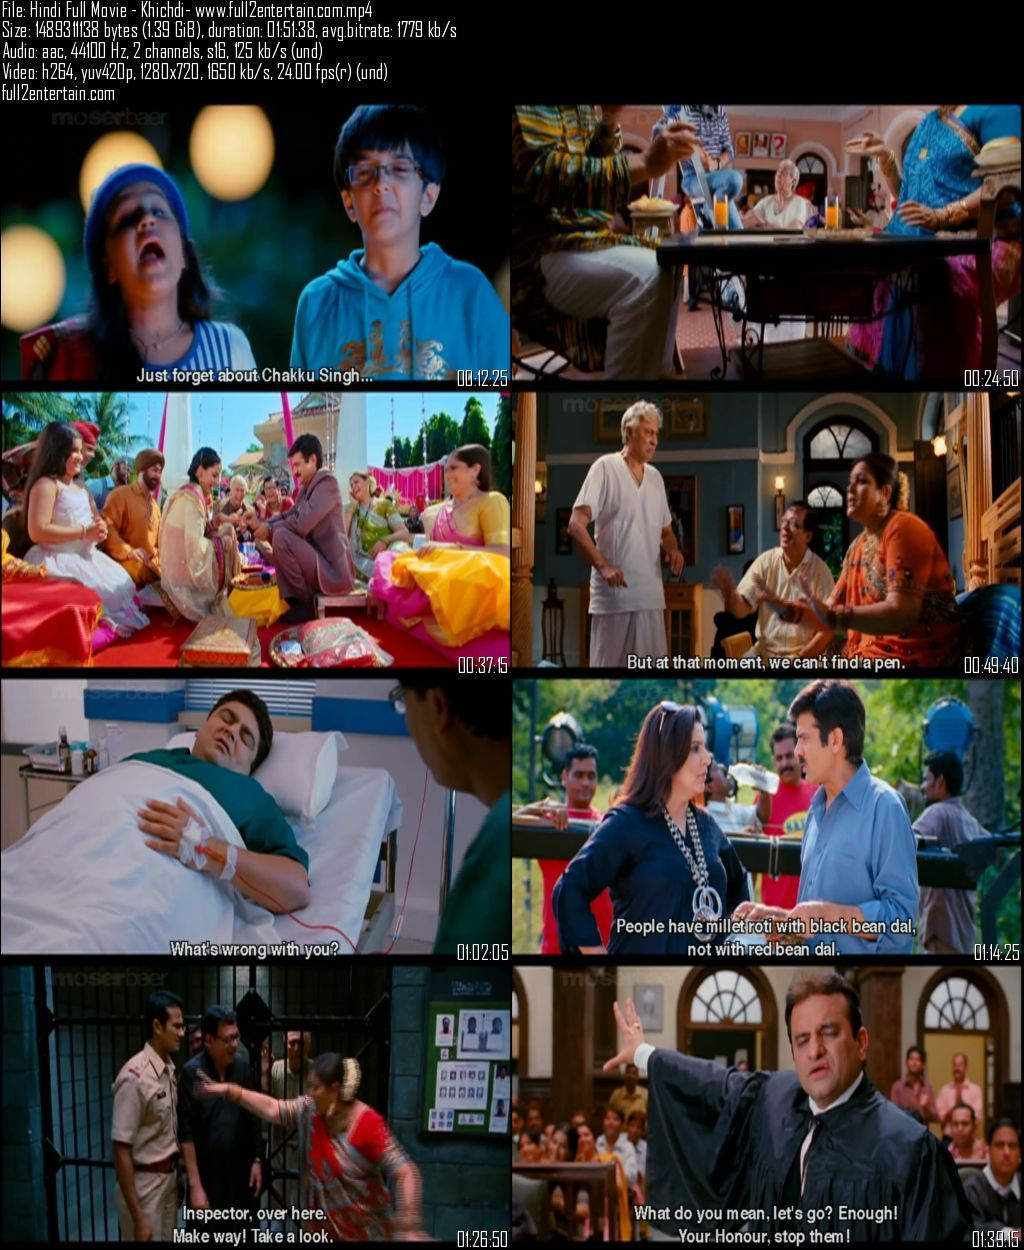 Khichdi: The Movie 2010 Full Movie Free Download HD